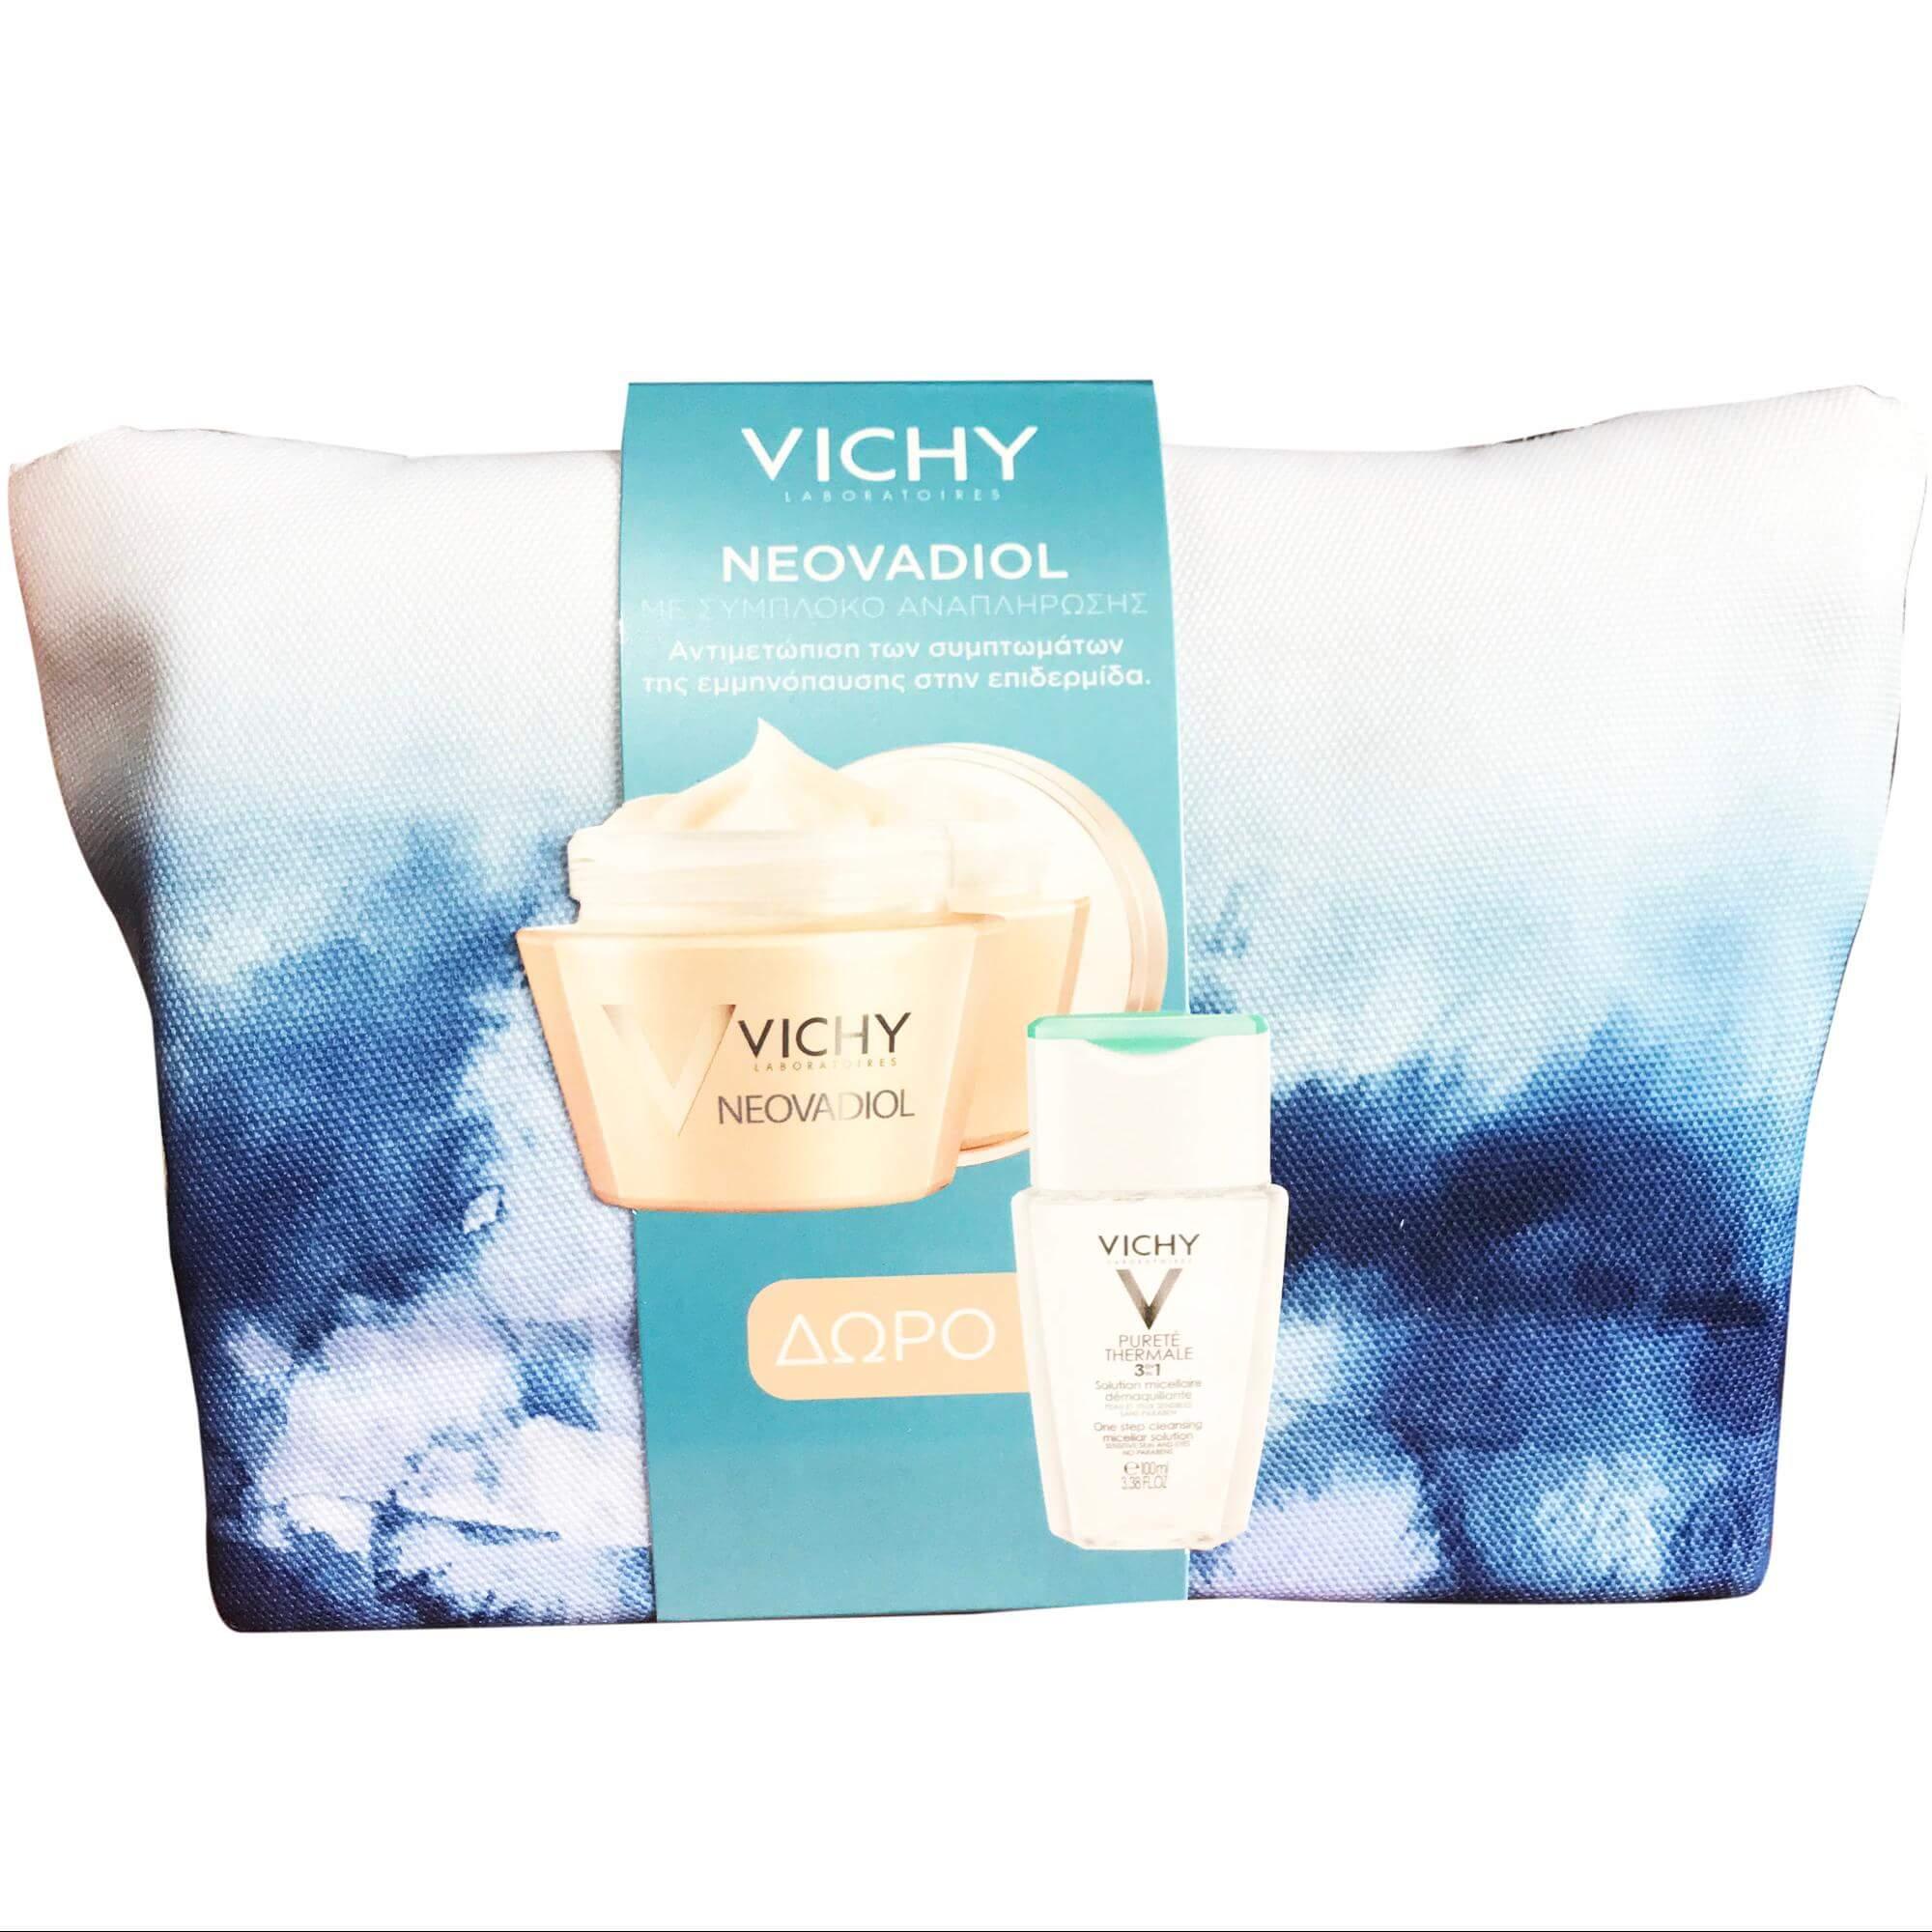 Vichy Πακέτο Προσφοράς NeovadiolΚρέμα Ημέρας50ml & ΔώροPurete Thermale 3-in-1 100ml &Neovadiol Elixir 3ml – Κανονικές-Μικτές Επιδερμίδες